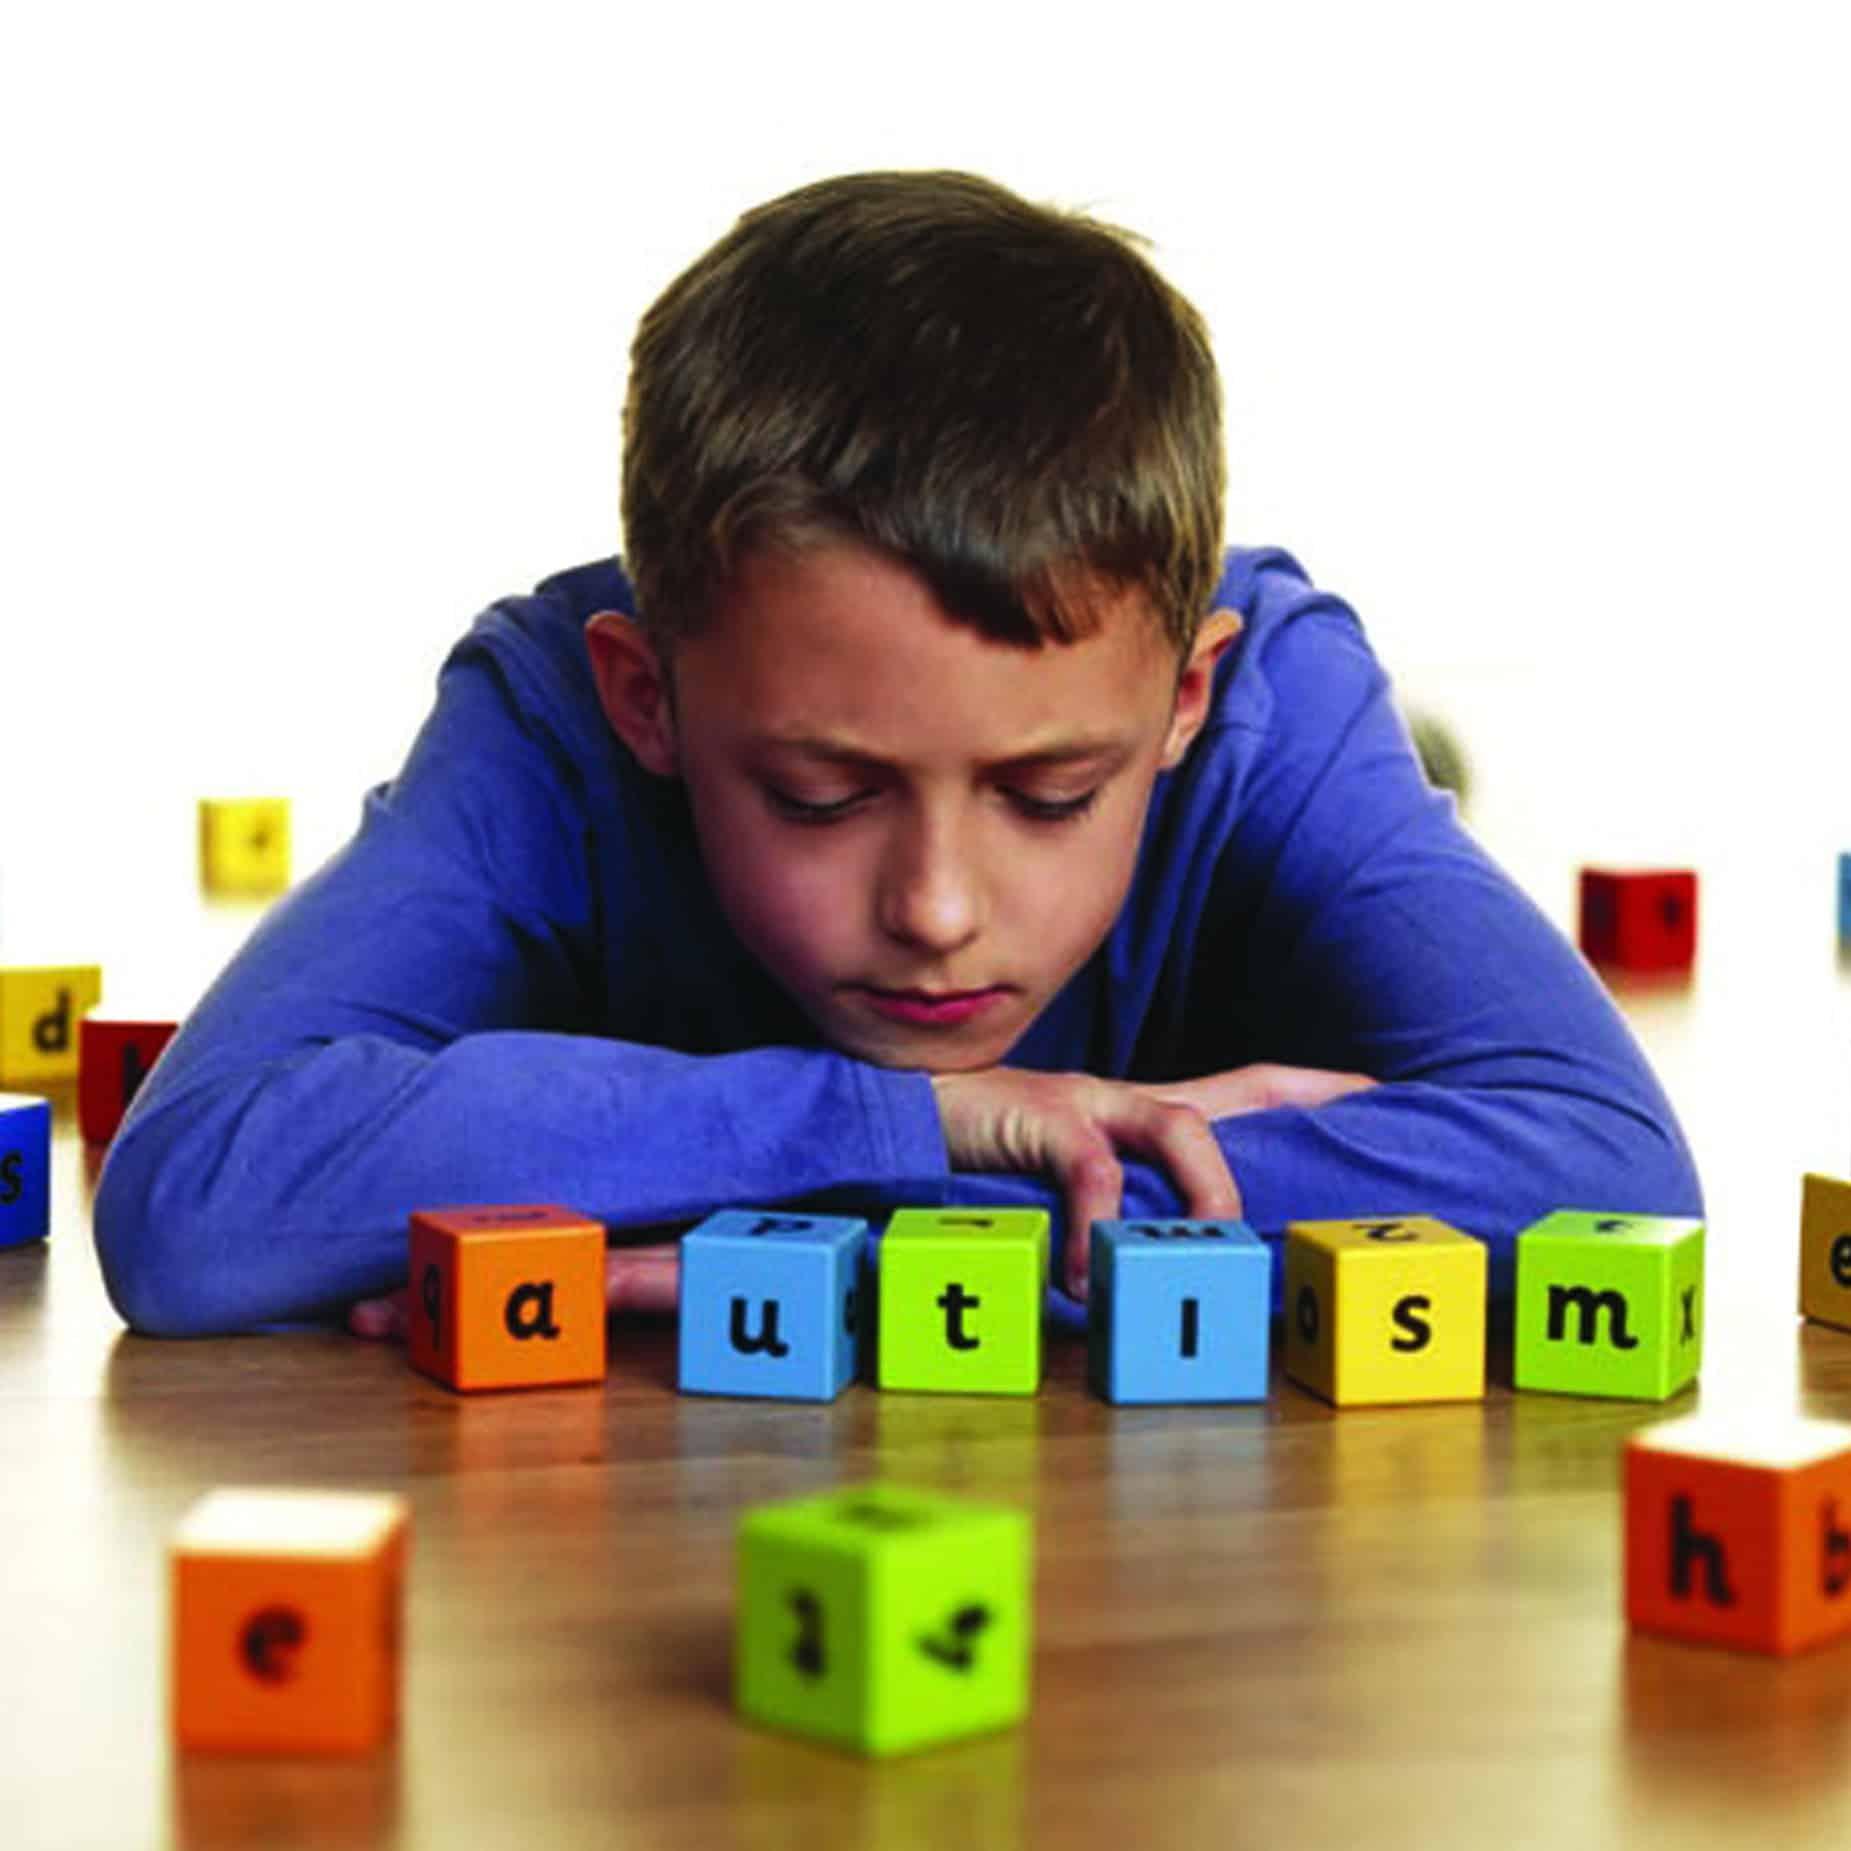 A boy staring at his toy blocks - NAET Dubai